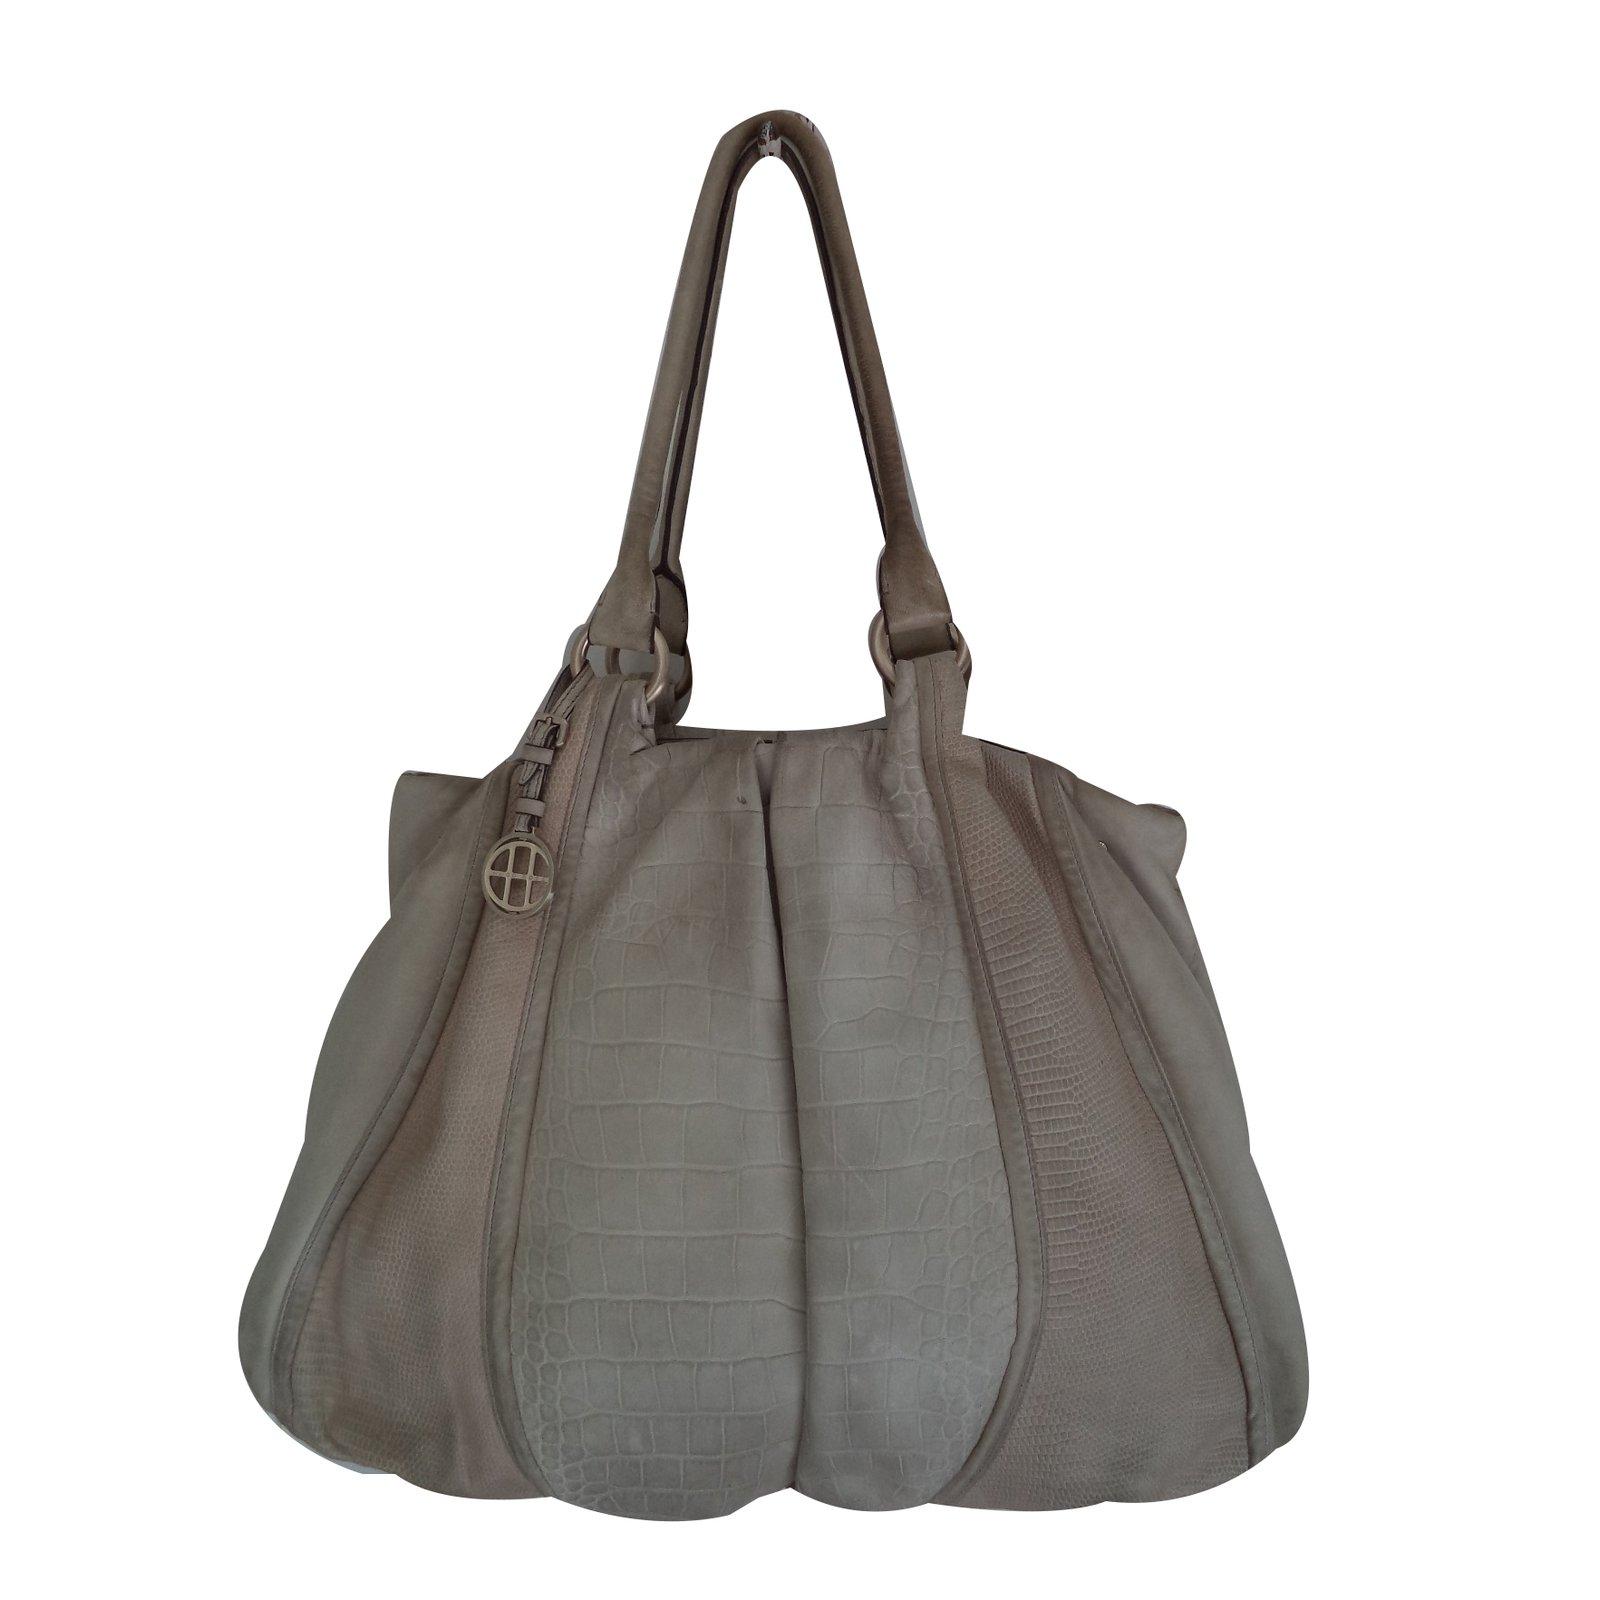 Hugo Boss Handbags Leather Other Ref 36449